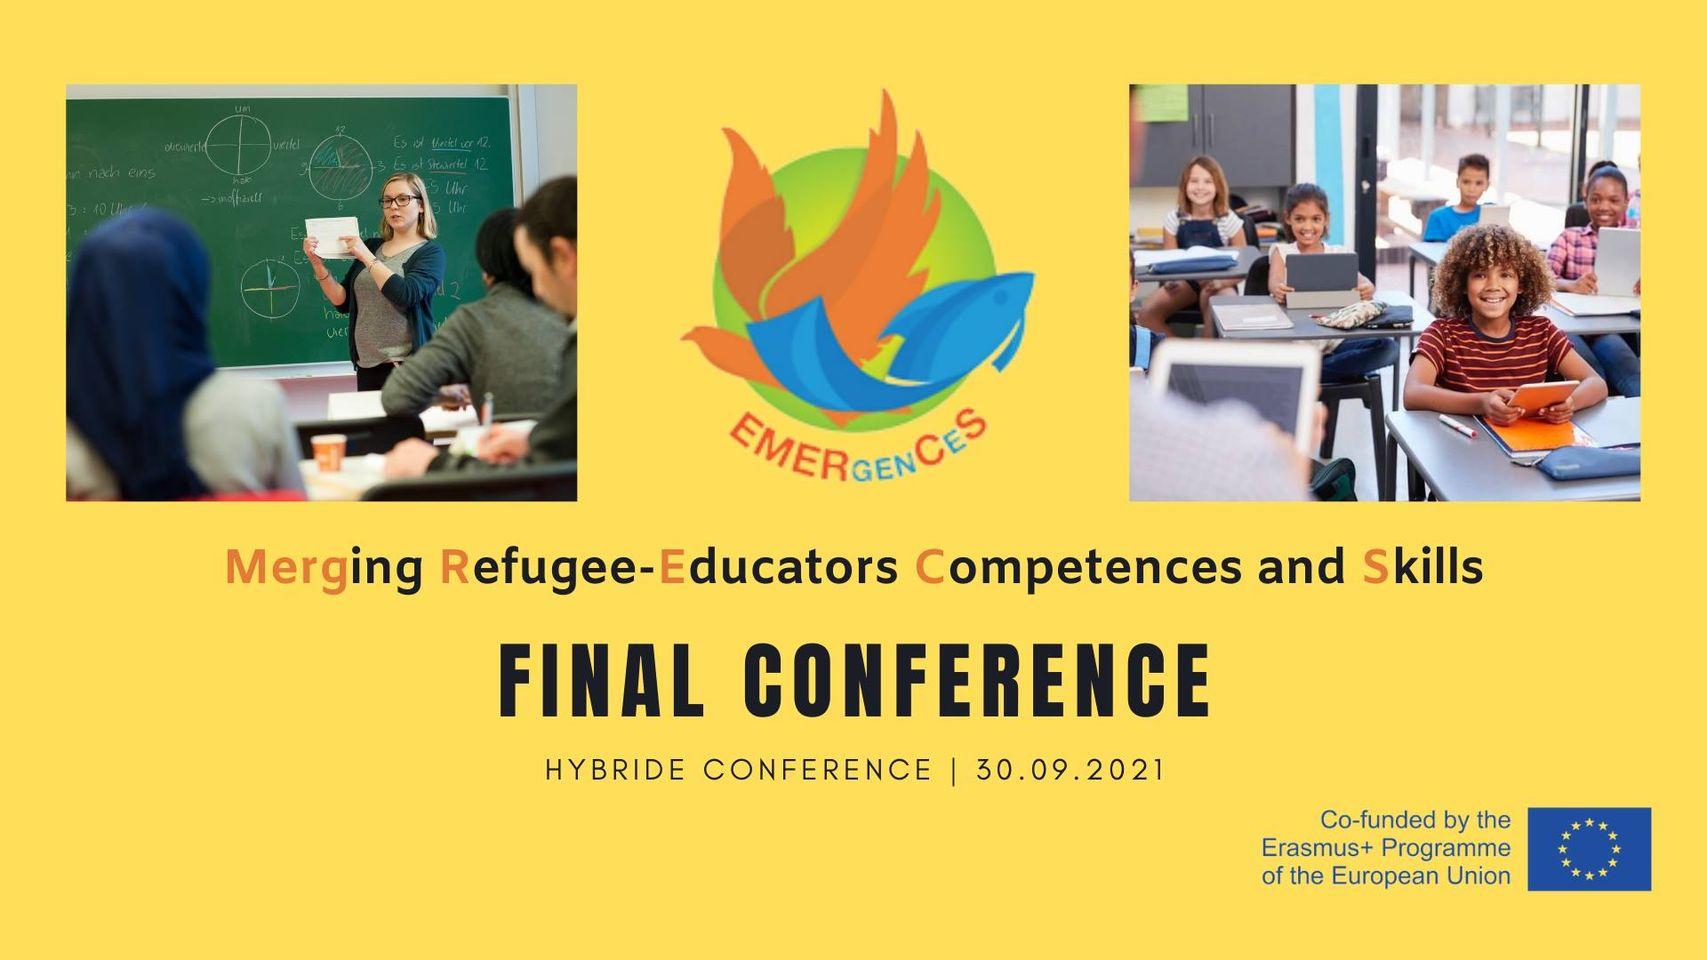 Telop-zakljucna-konferenca-Emergences